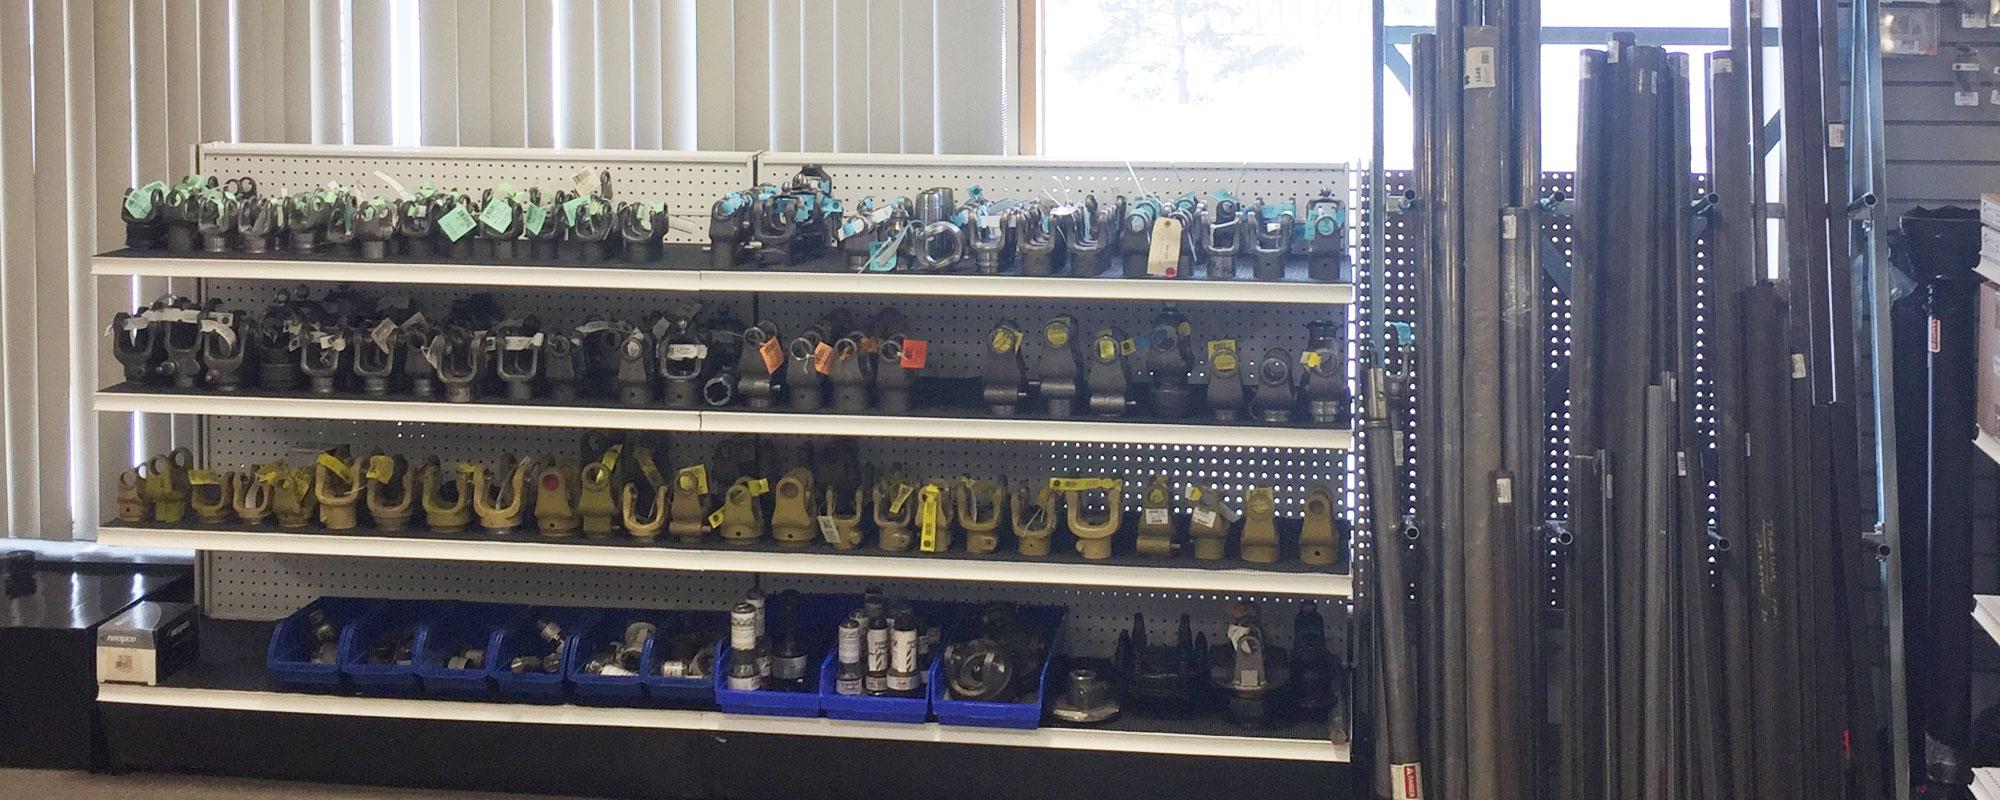 Shelves of bearing supplies